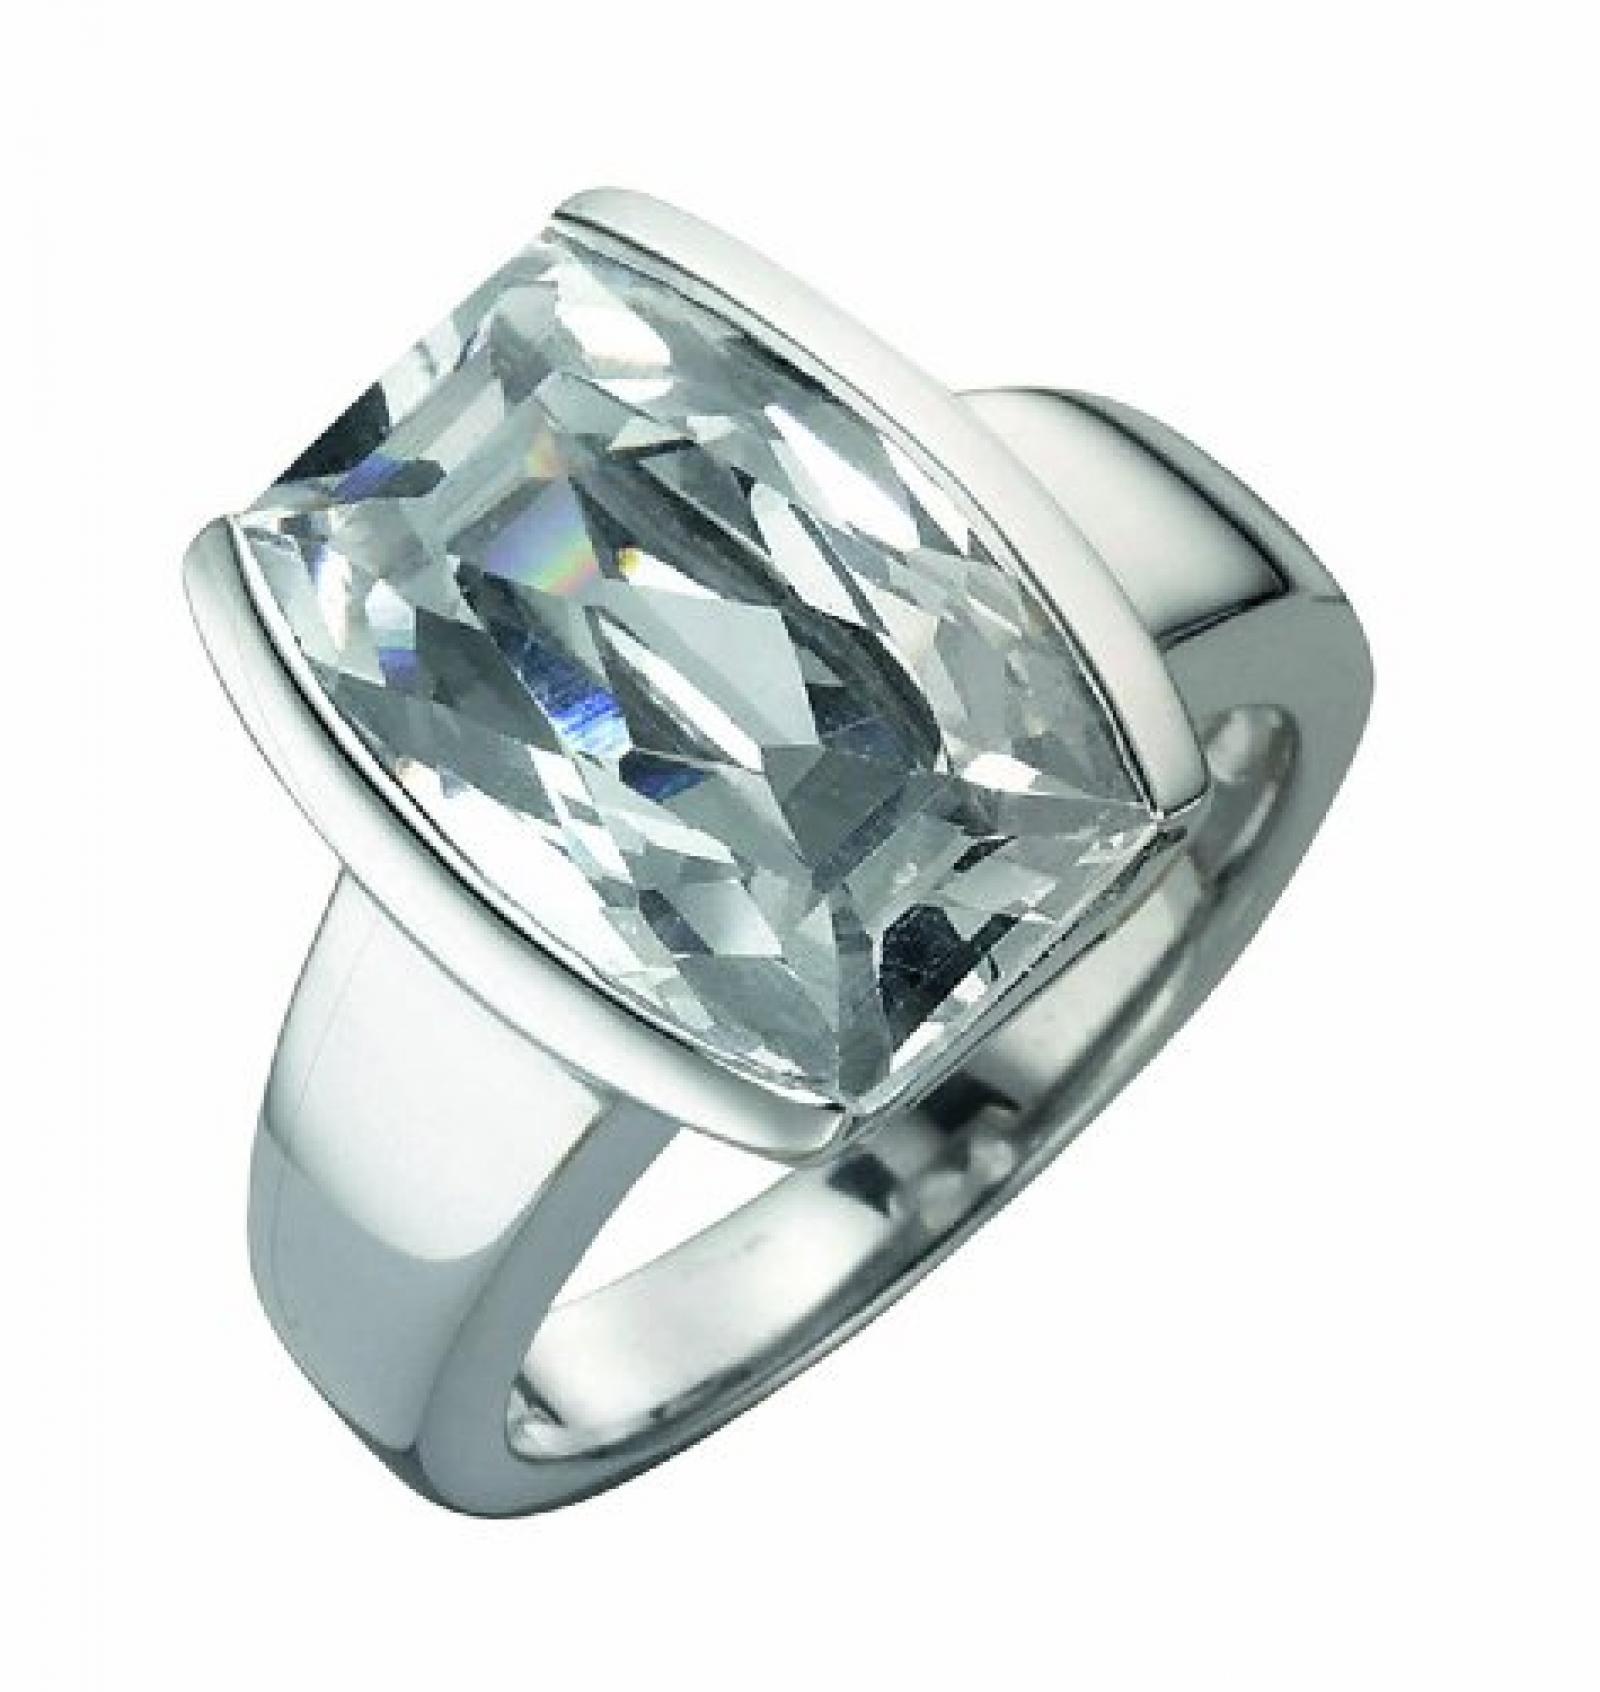 Celesta Damen-Ring 925 Sterling Silber Zirkonia weiß Gr. 57 (18.1) 273270779-9-018